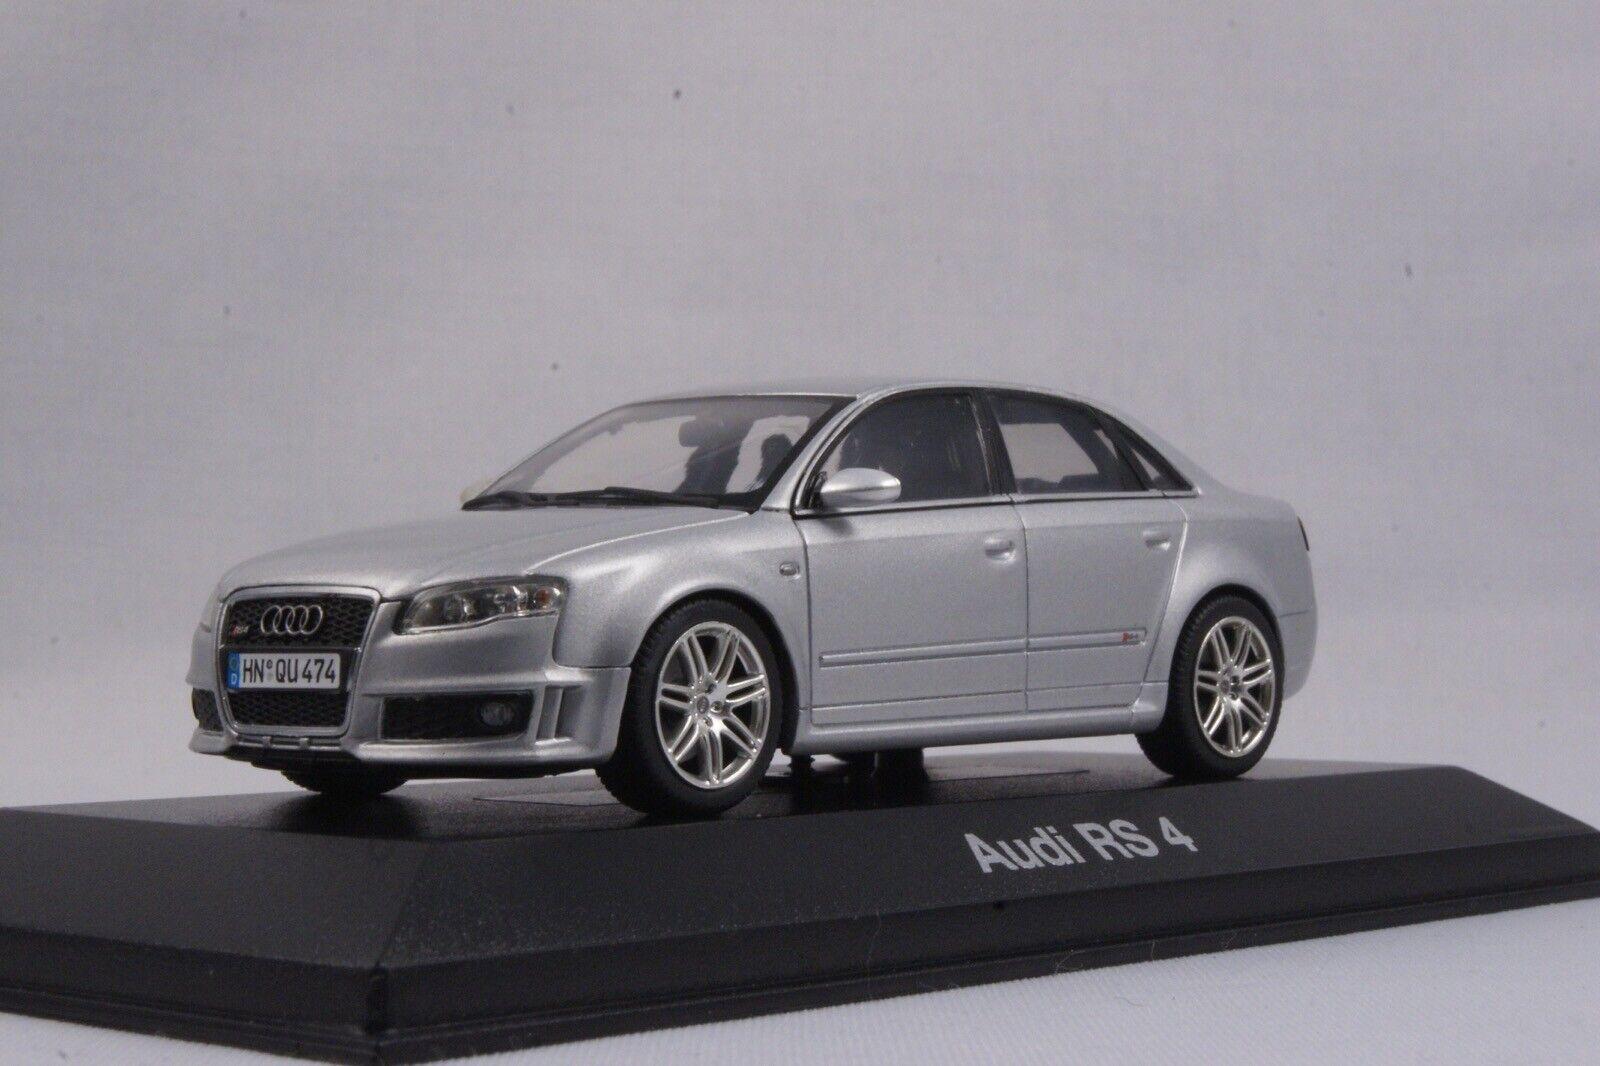 Audi collection 1 43 - RS4 (B7) 2005-2009 Lichtsilber MINICHAMPS